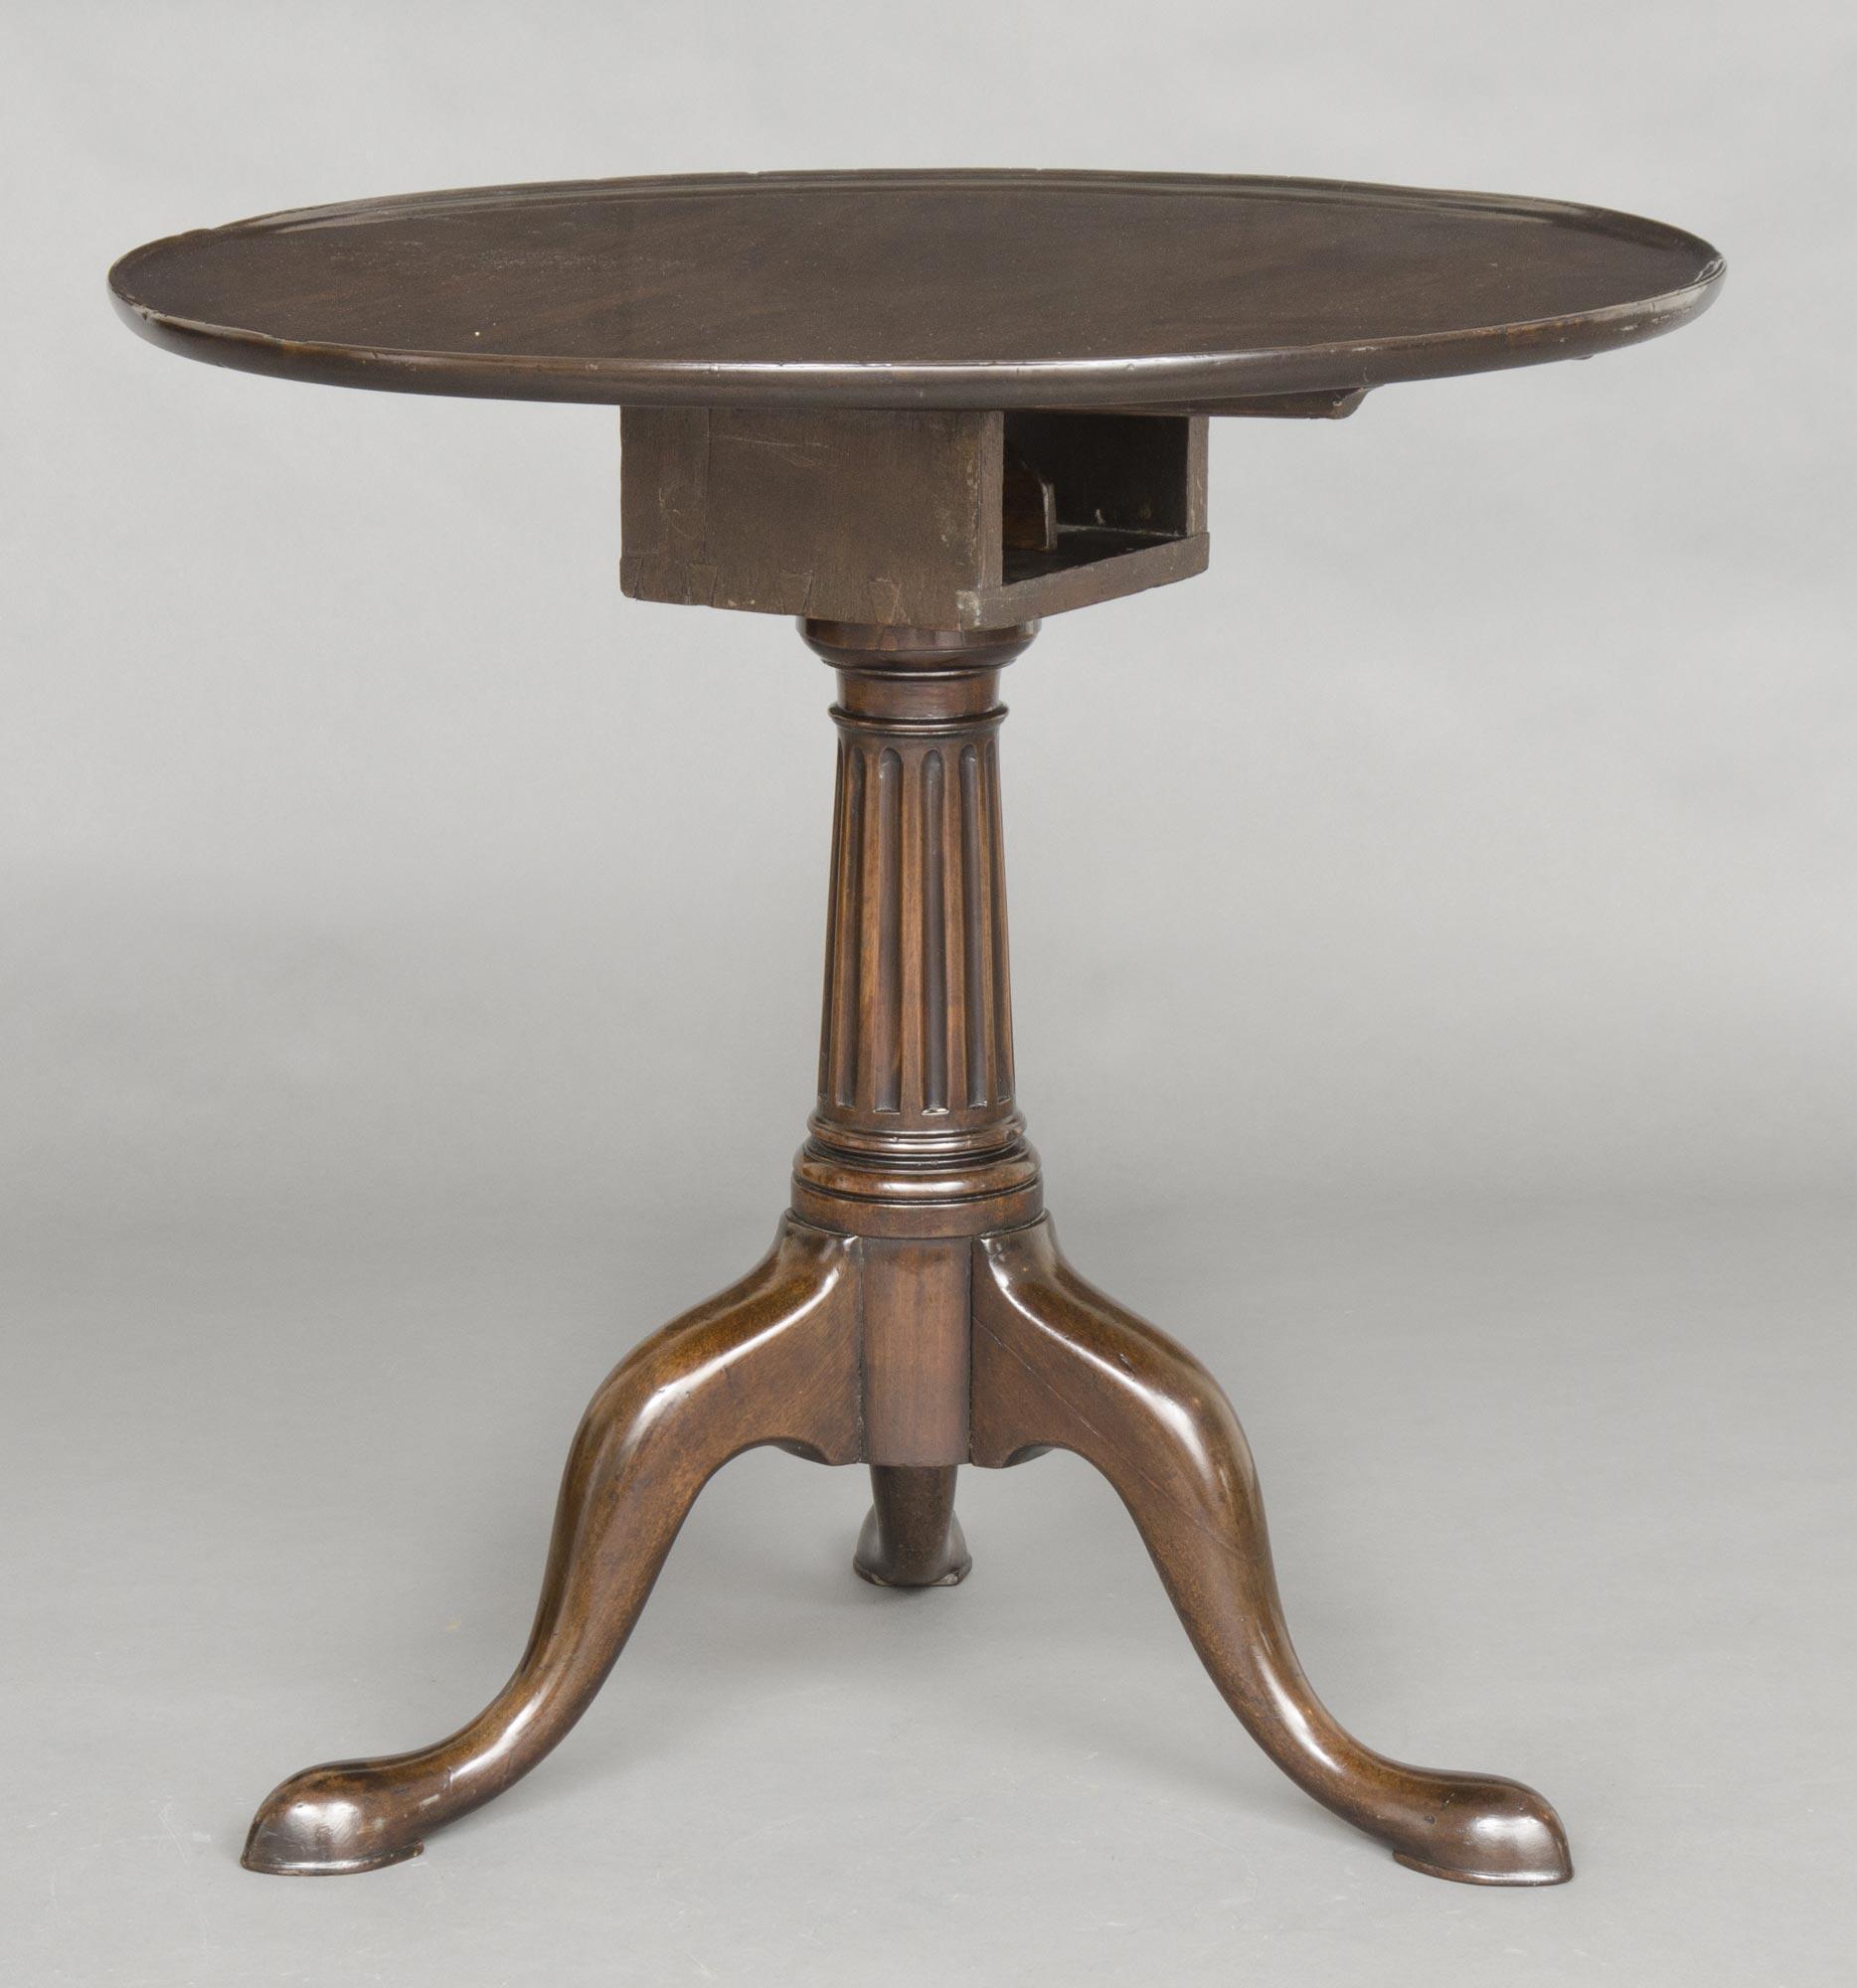 George Ii Walnut Tripod Tea Table Circular Antique Tea